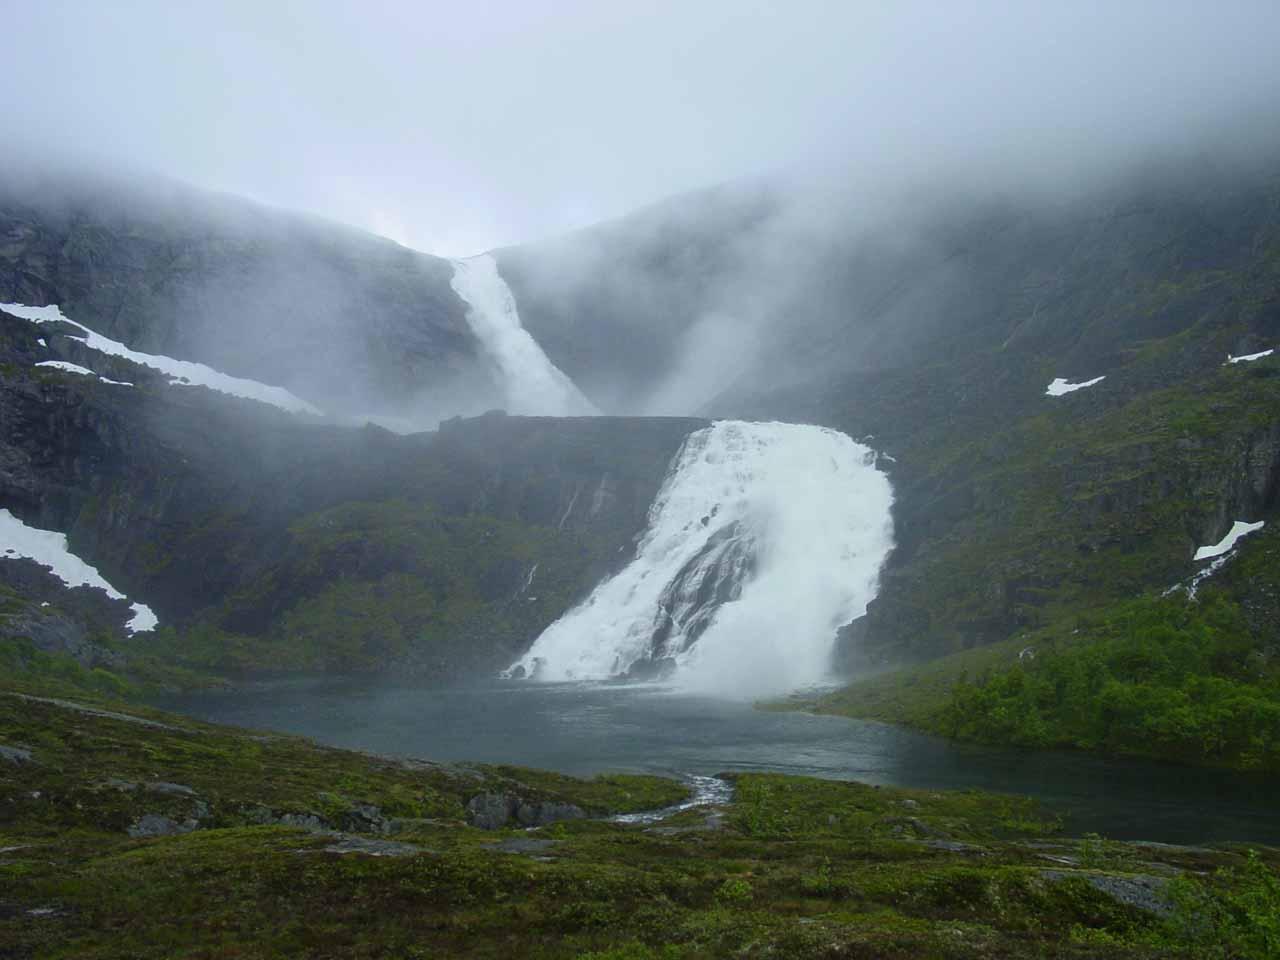 Søtefossen - the last of the four major waterfalls in Husedal Valley